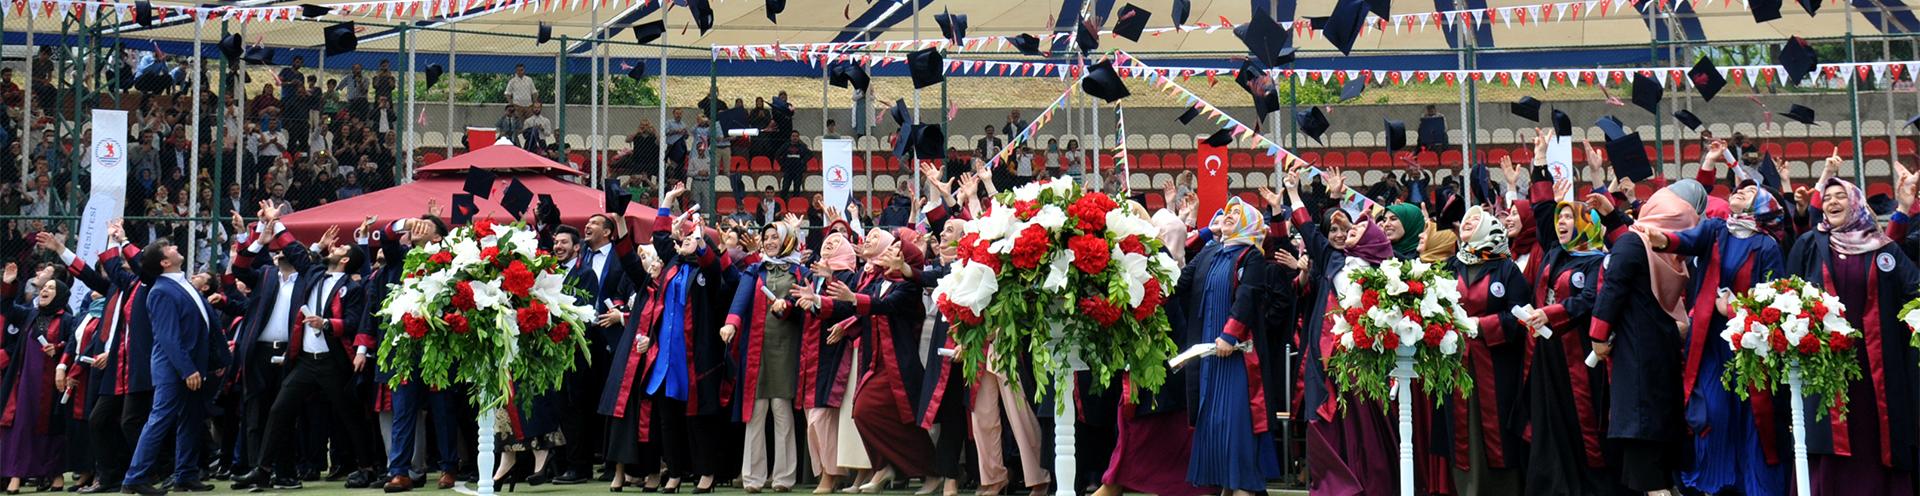 http://www.omu.edu.tr/sites/default/files/files/ilahiyat_fakultesinde_mezuniyet_sevinci/ilahiyat.jpg